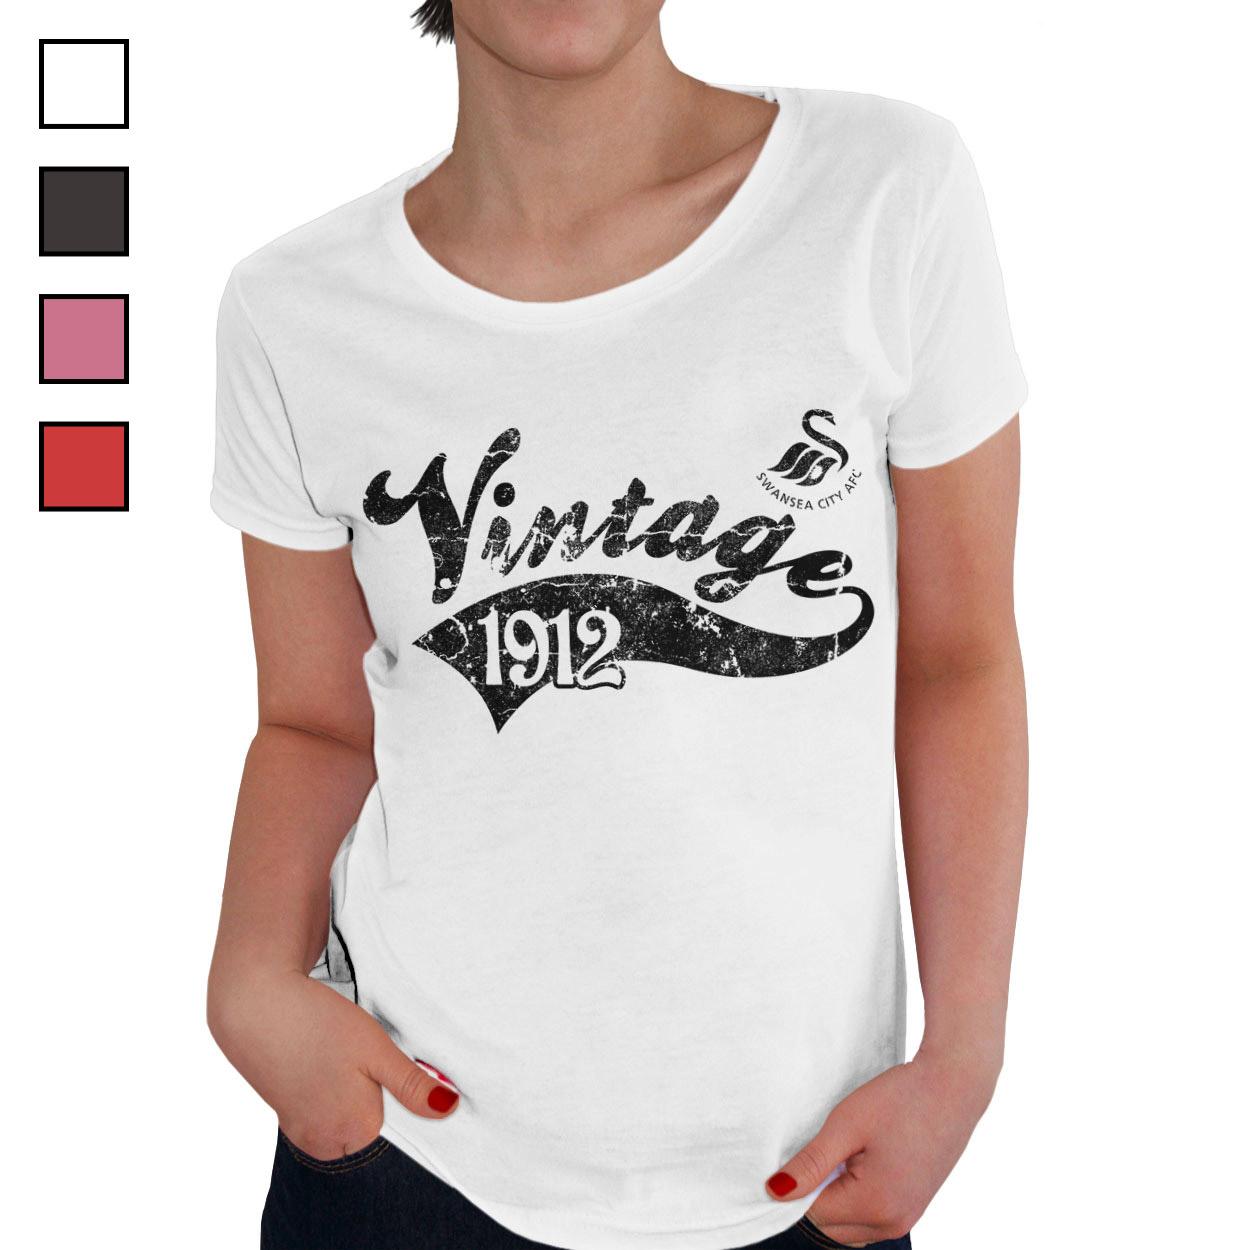 Swansea City AFC Ladies Vintage T-Shirt